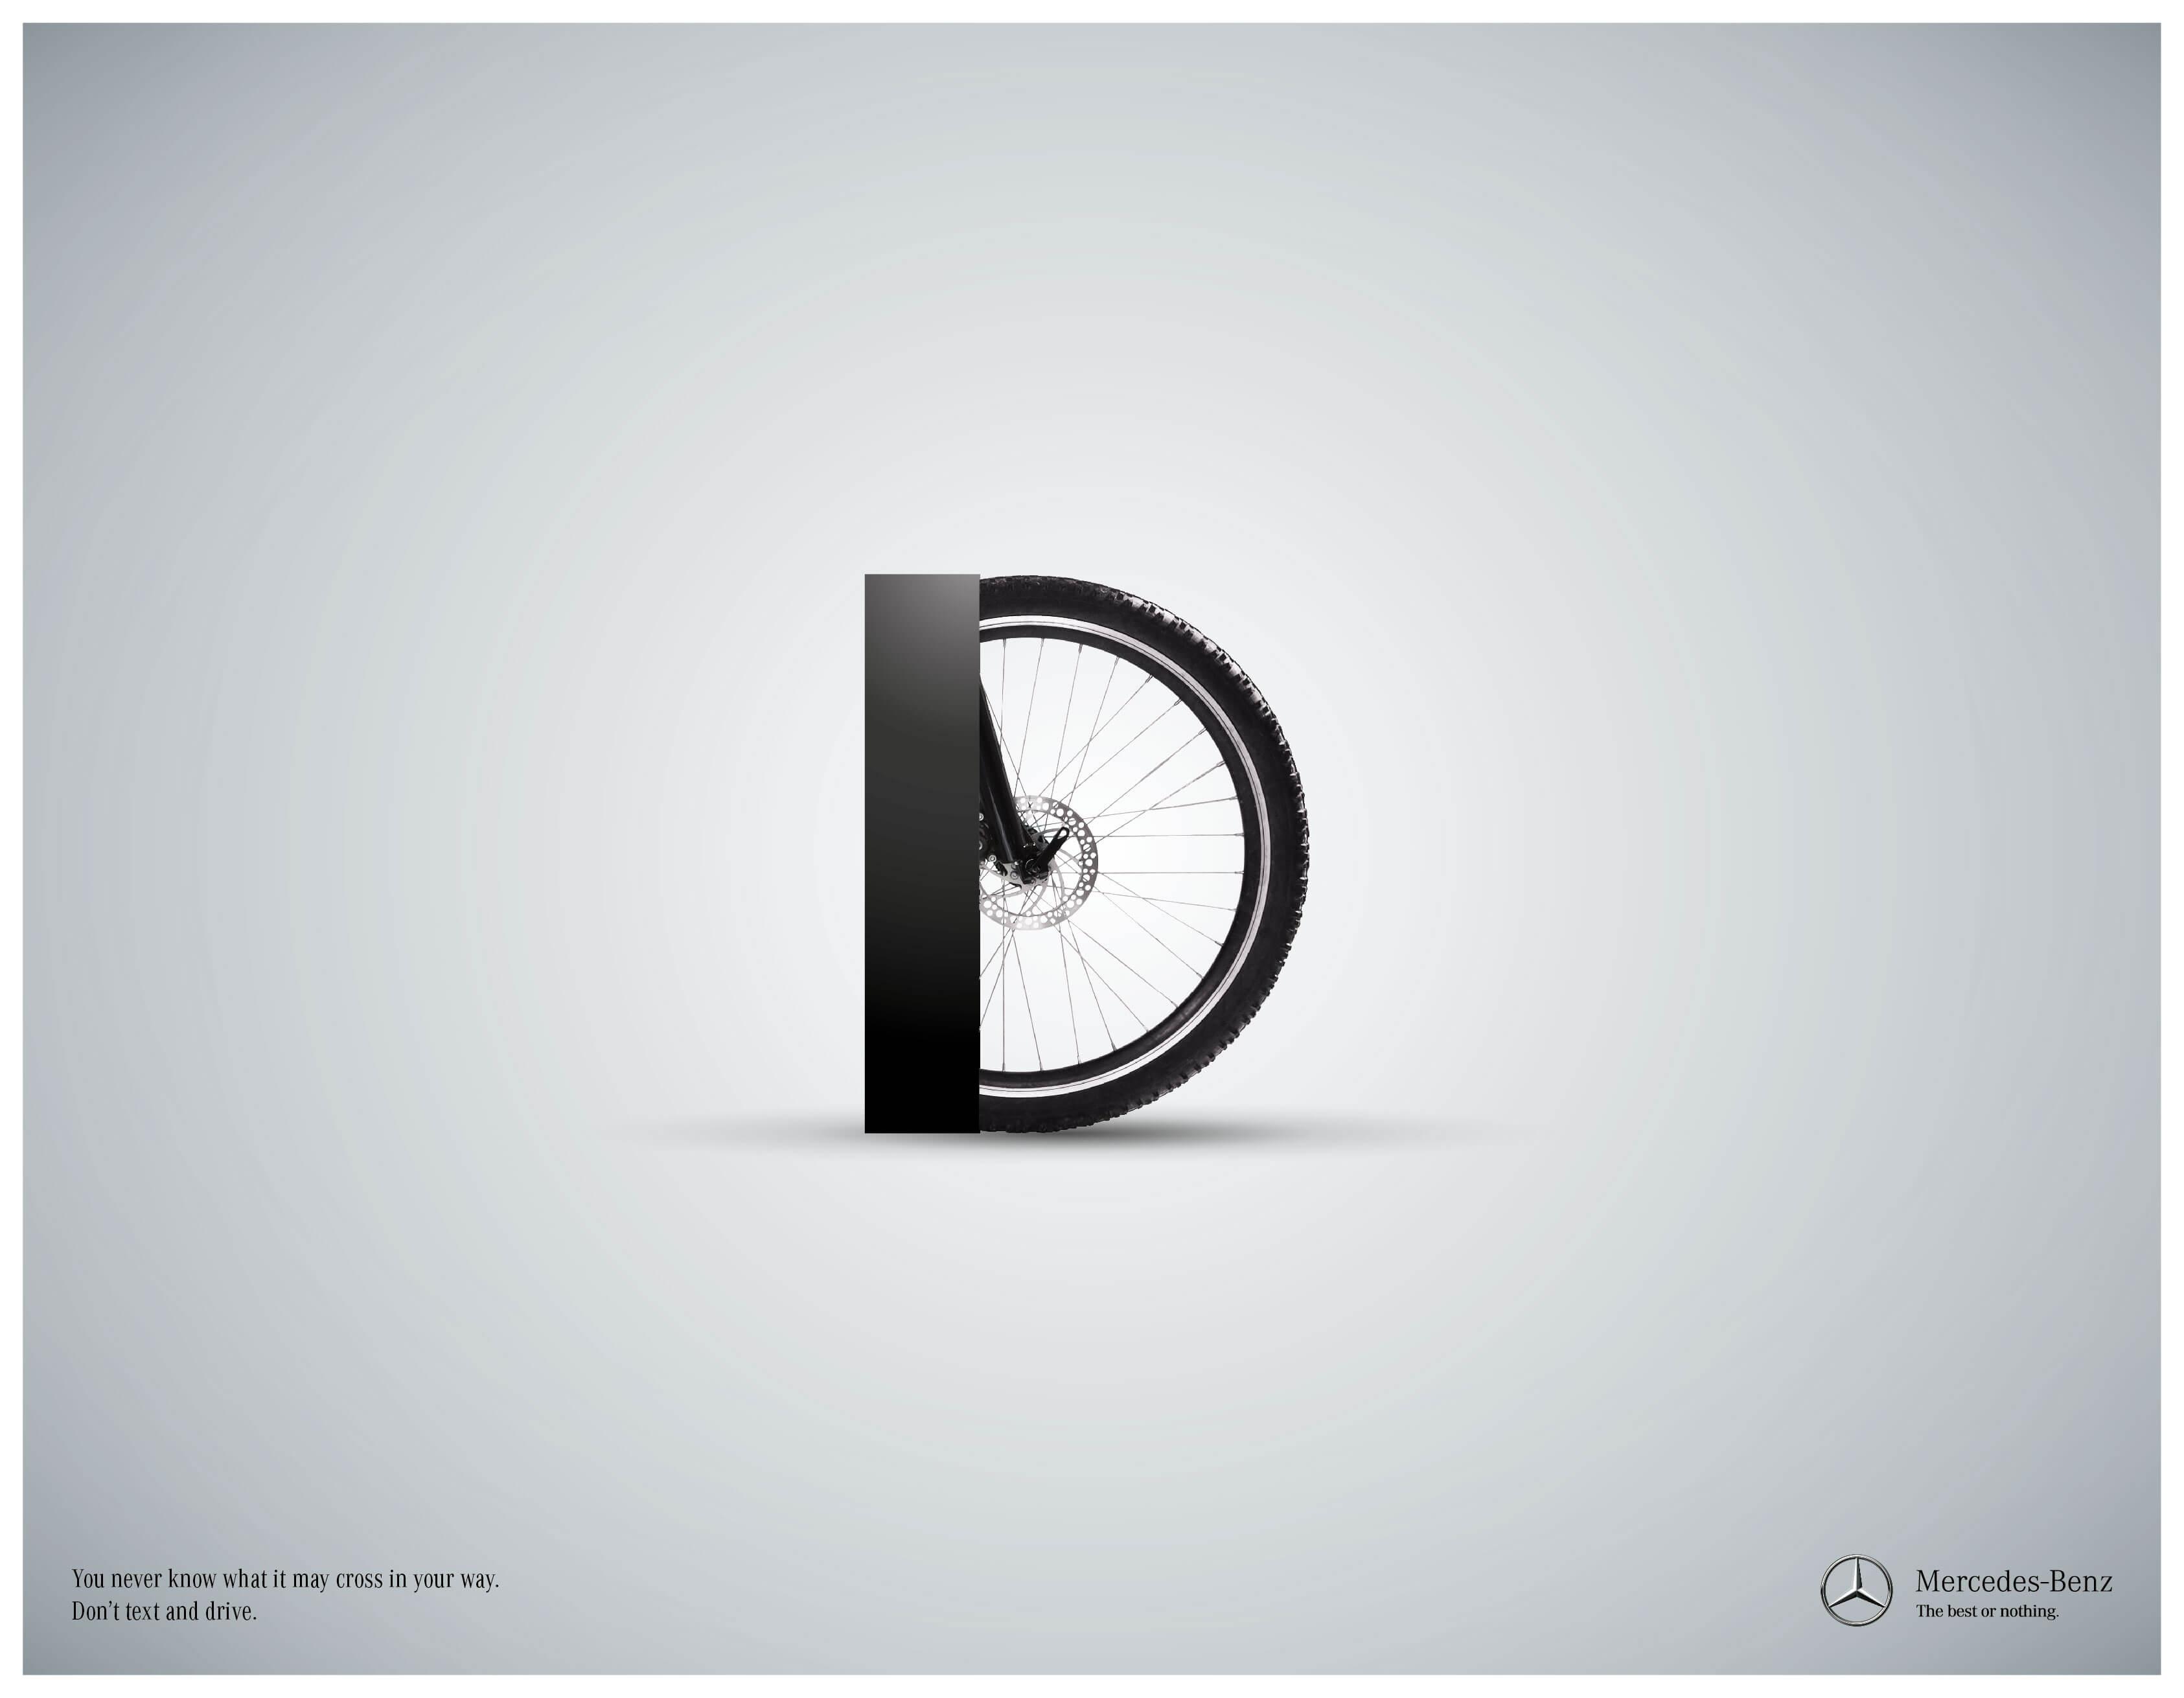 Mercedes-Benz: Letras mortales.